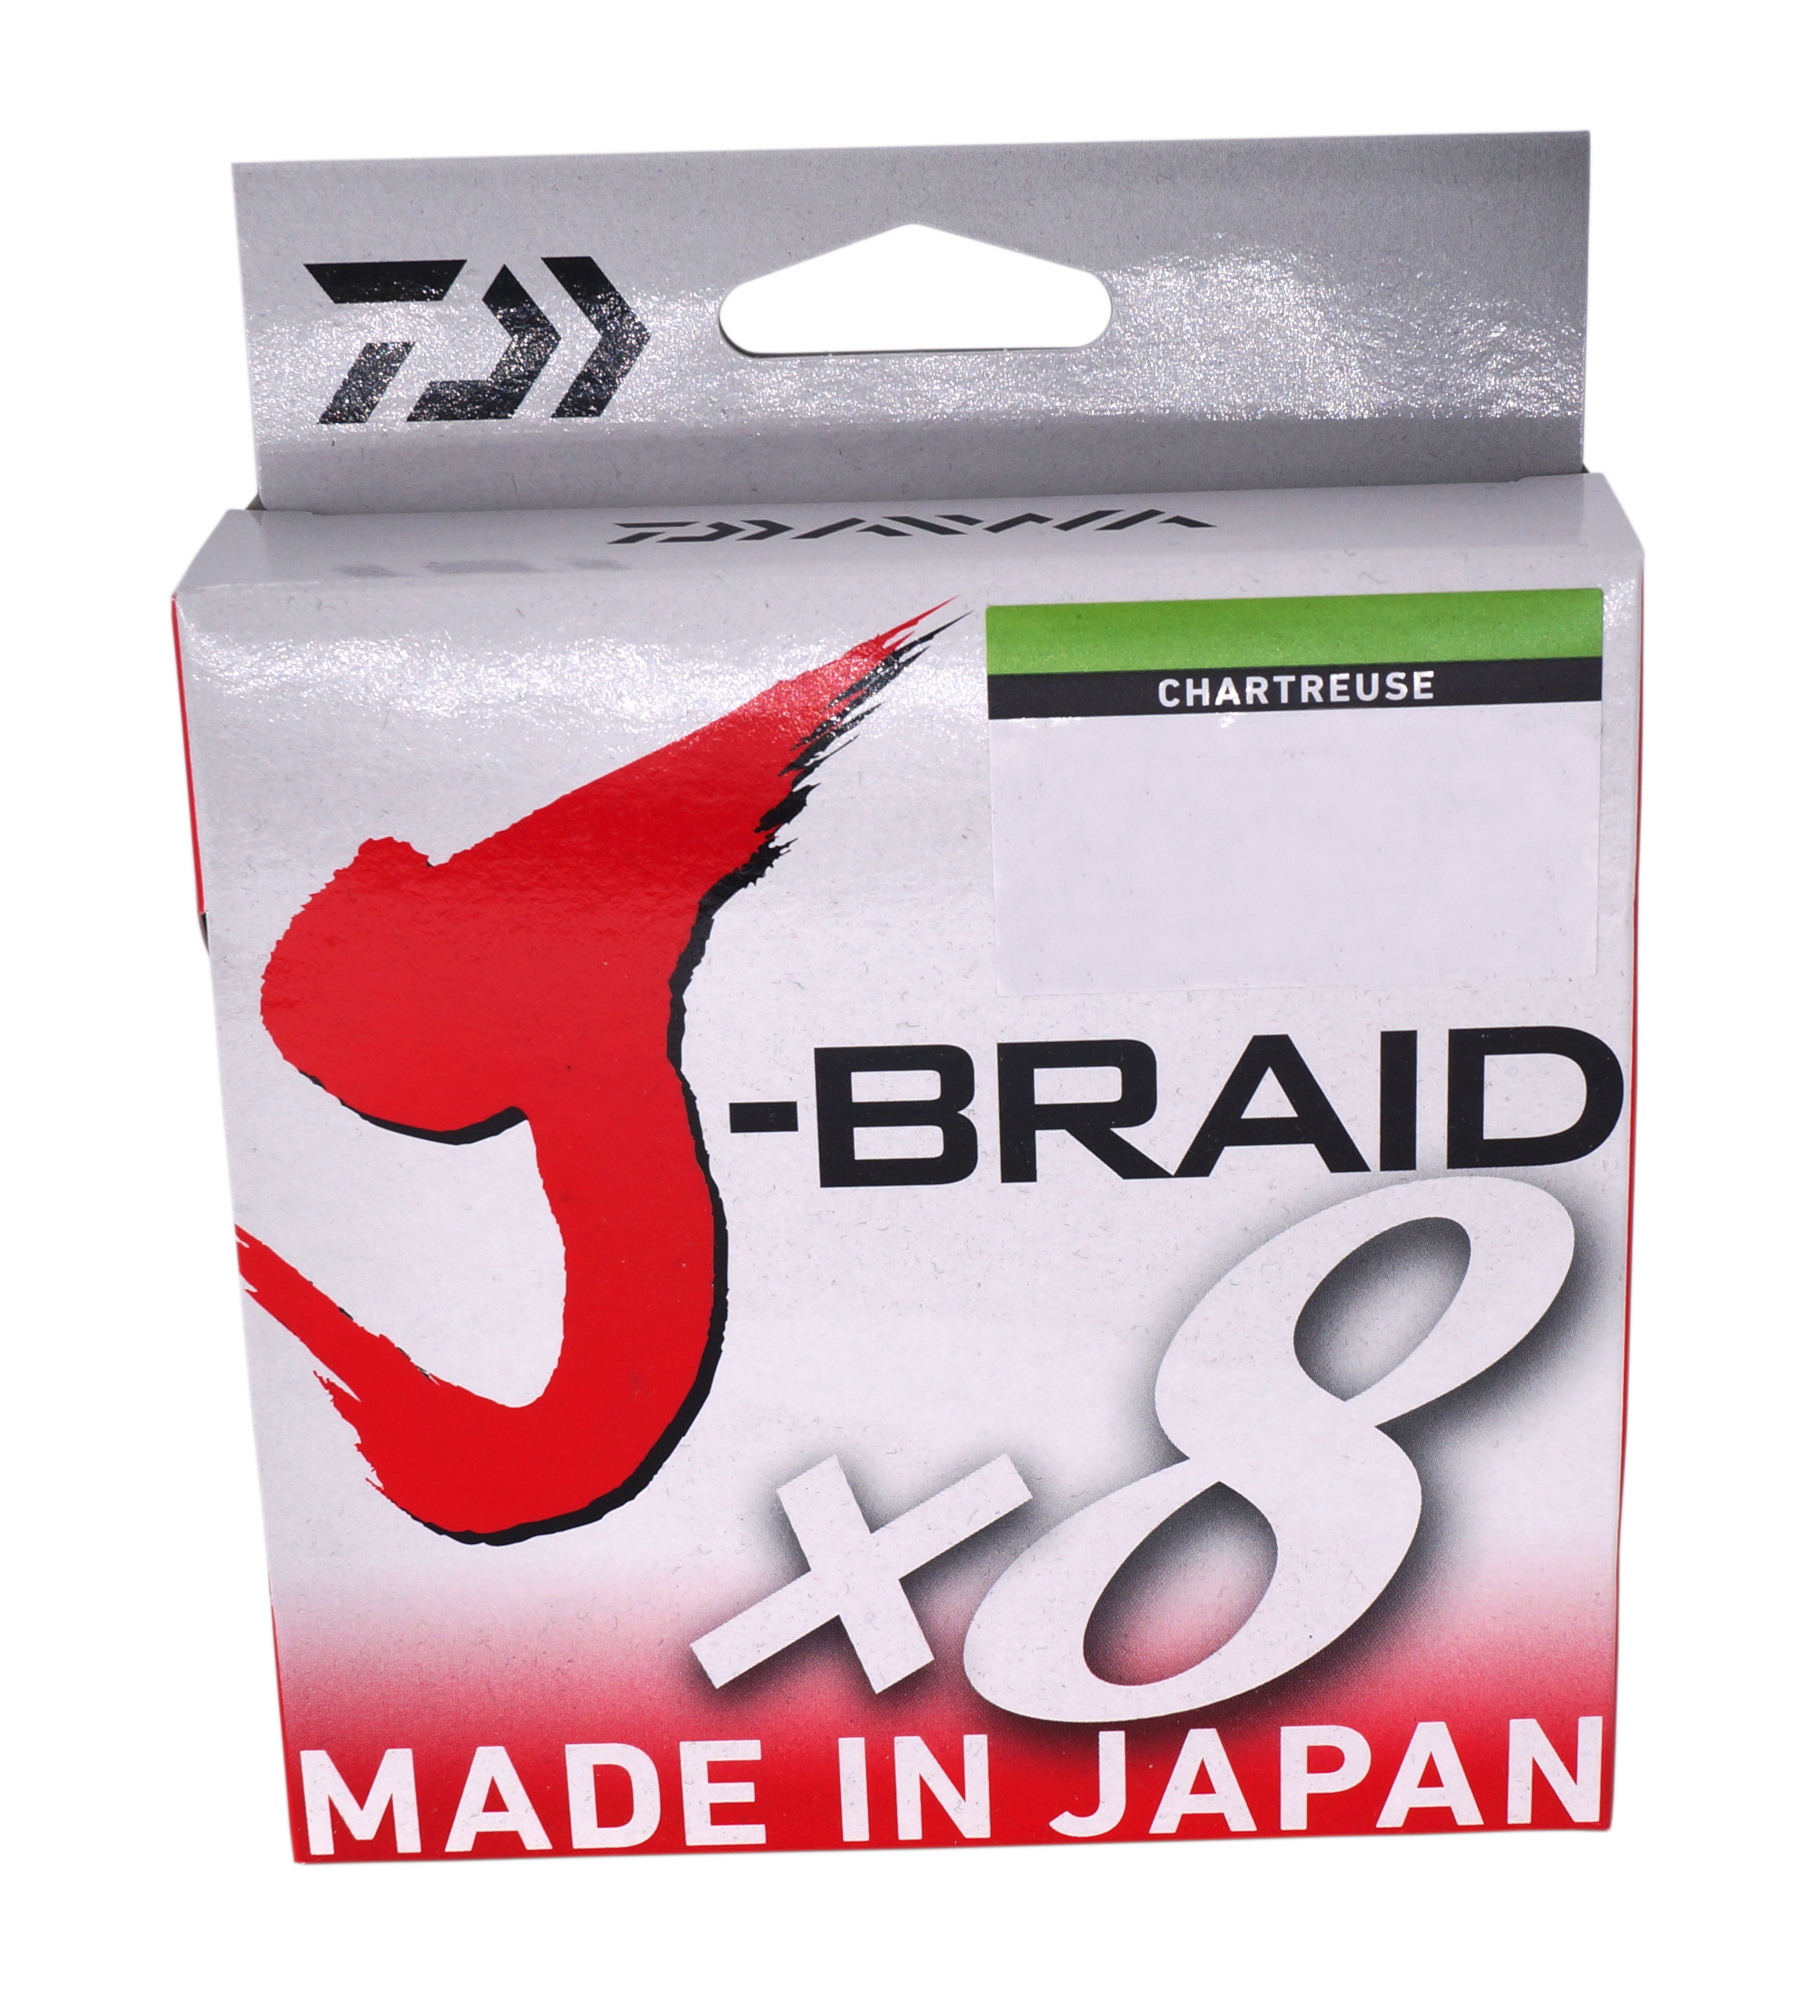 Details about  /Daiwa J Braid x8 Line PE 150m Chartreuse